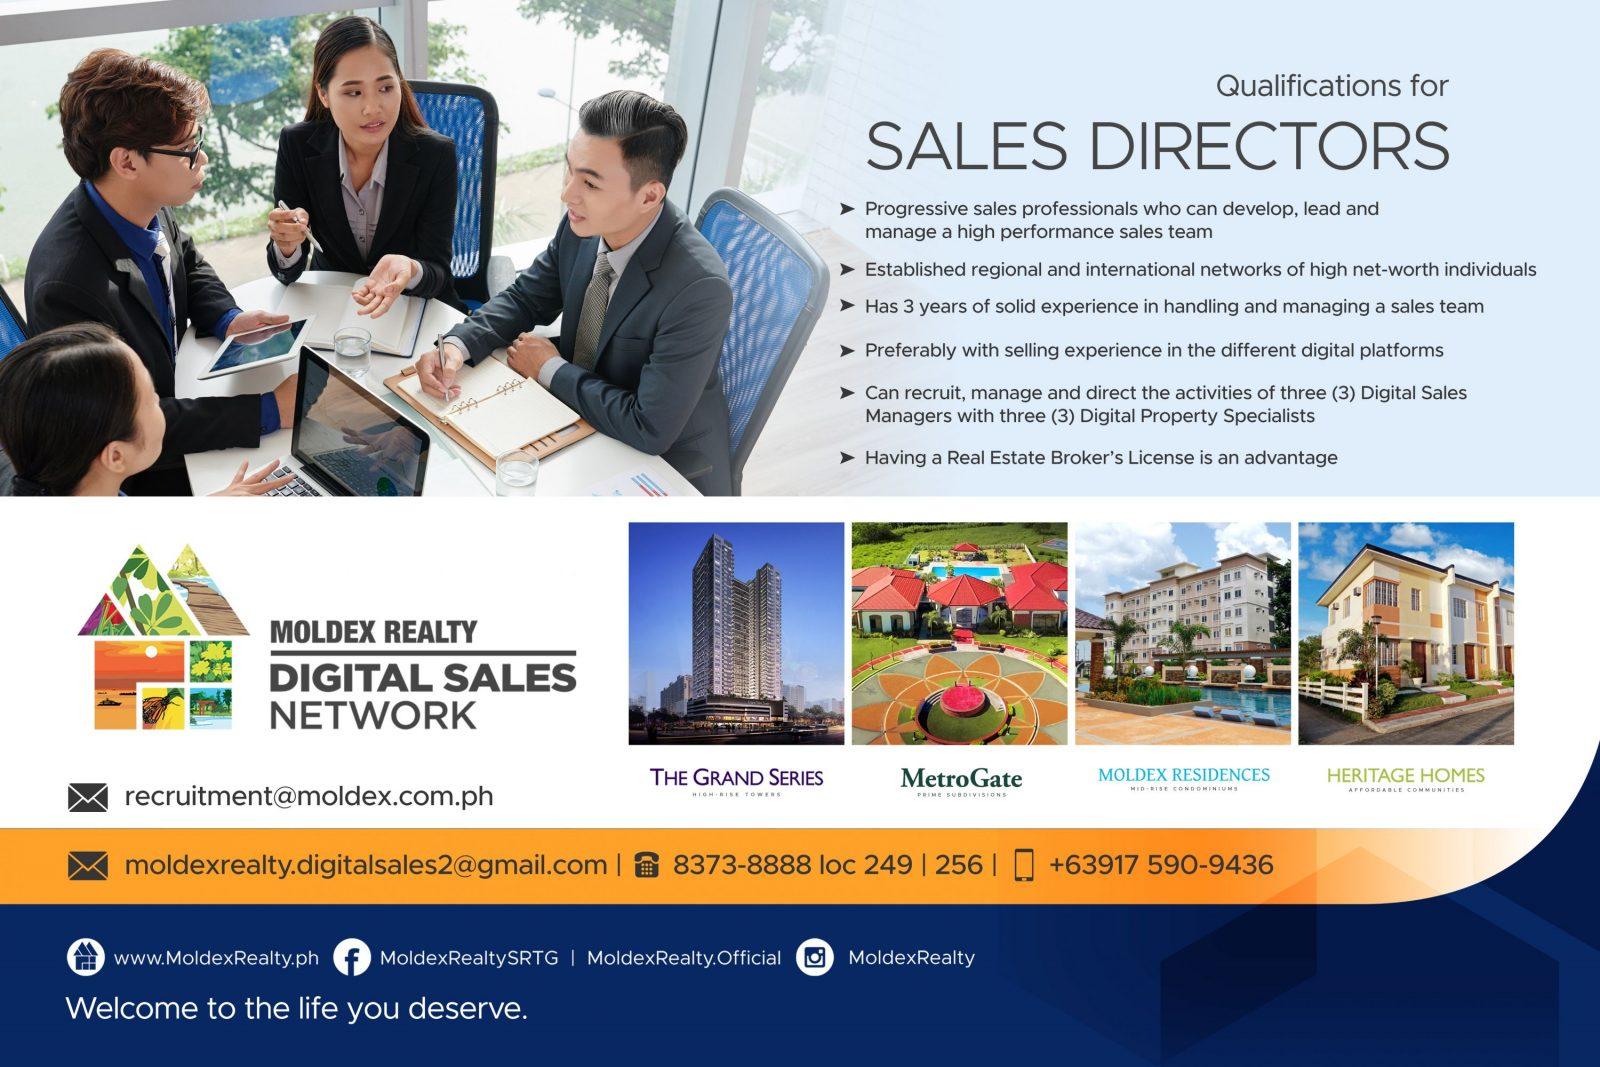 We're looking for new Sales Directors